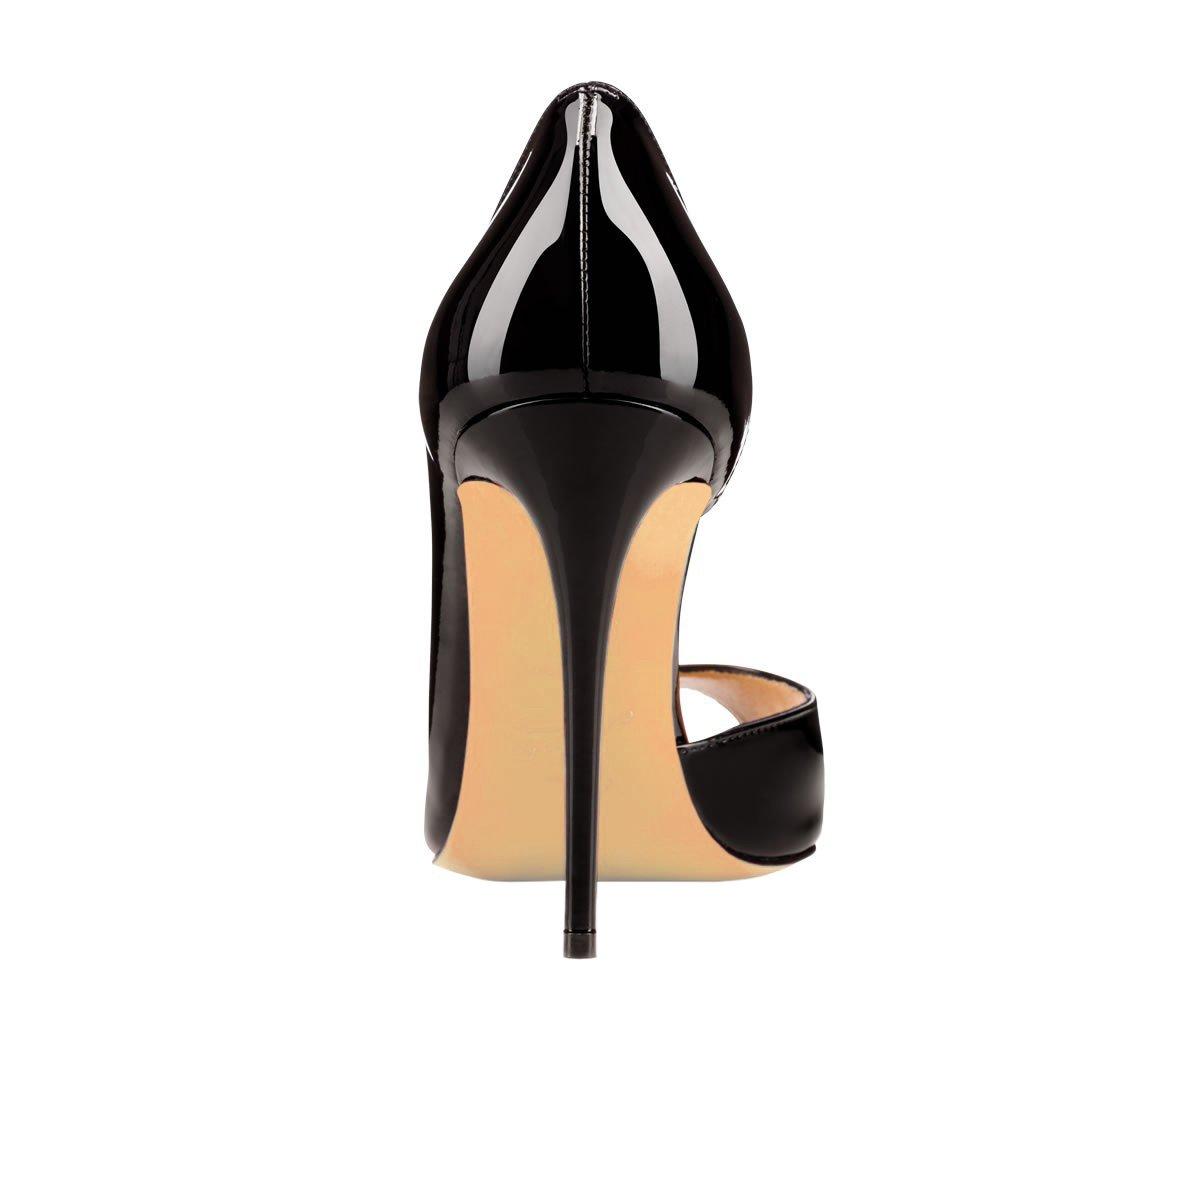 Chris-T Women Fashion D'Orsay Peep Toe with High Heel Stiletto Dress Party Pumps Size 5-15 US B07F7VFJ3Q 6 B(M) US|Black/Red S0le(bottom)